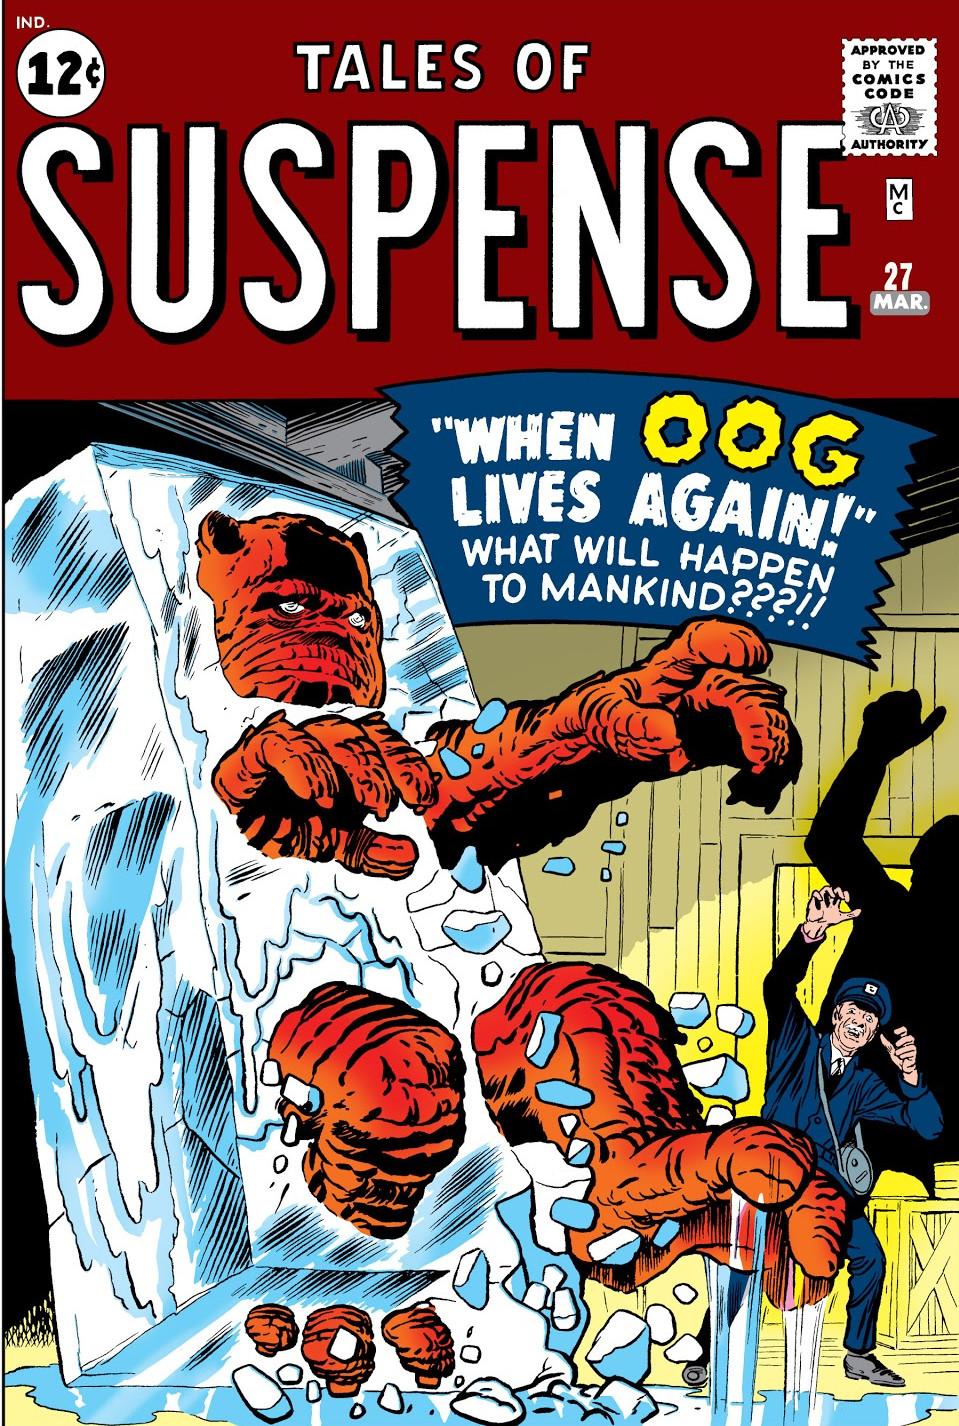 Tales of Suspense Vol 1 27